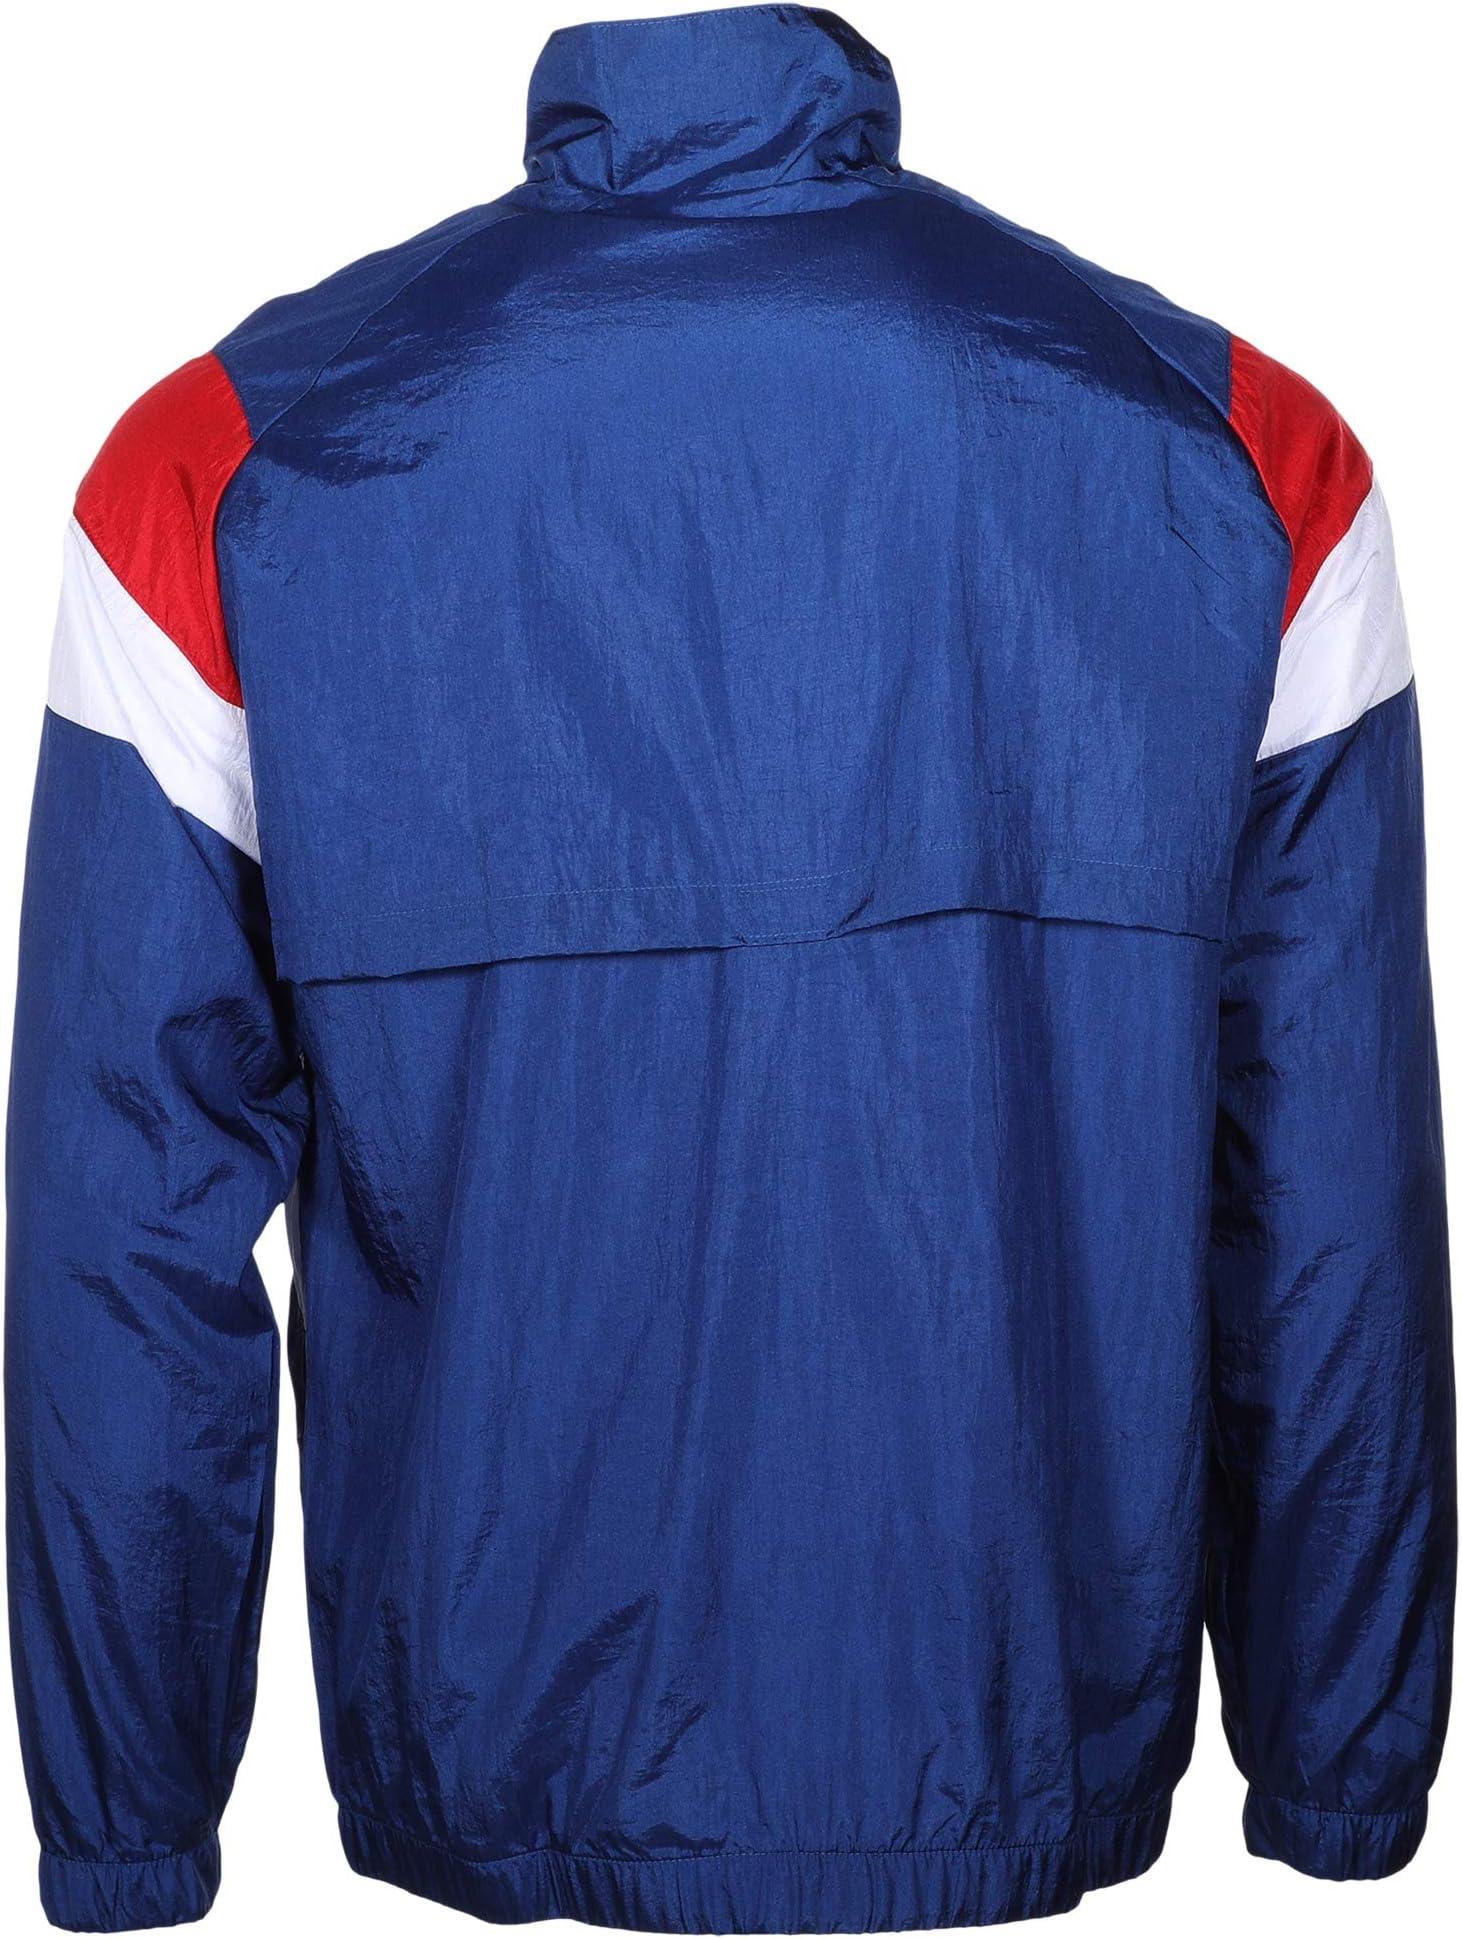 Champion Nylon Warm Up Jacket 9qYMq